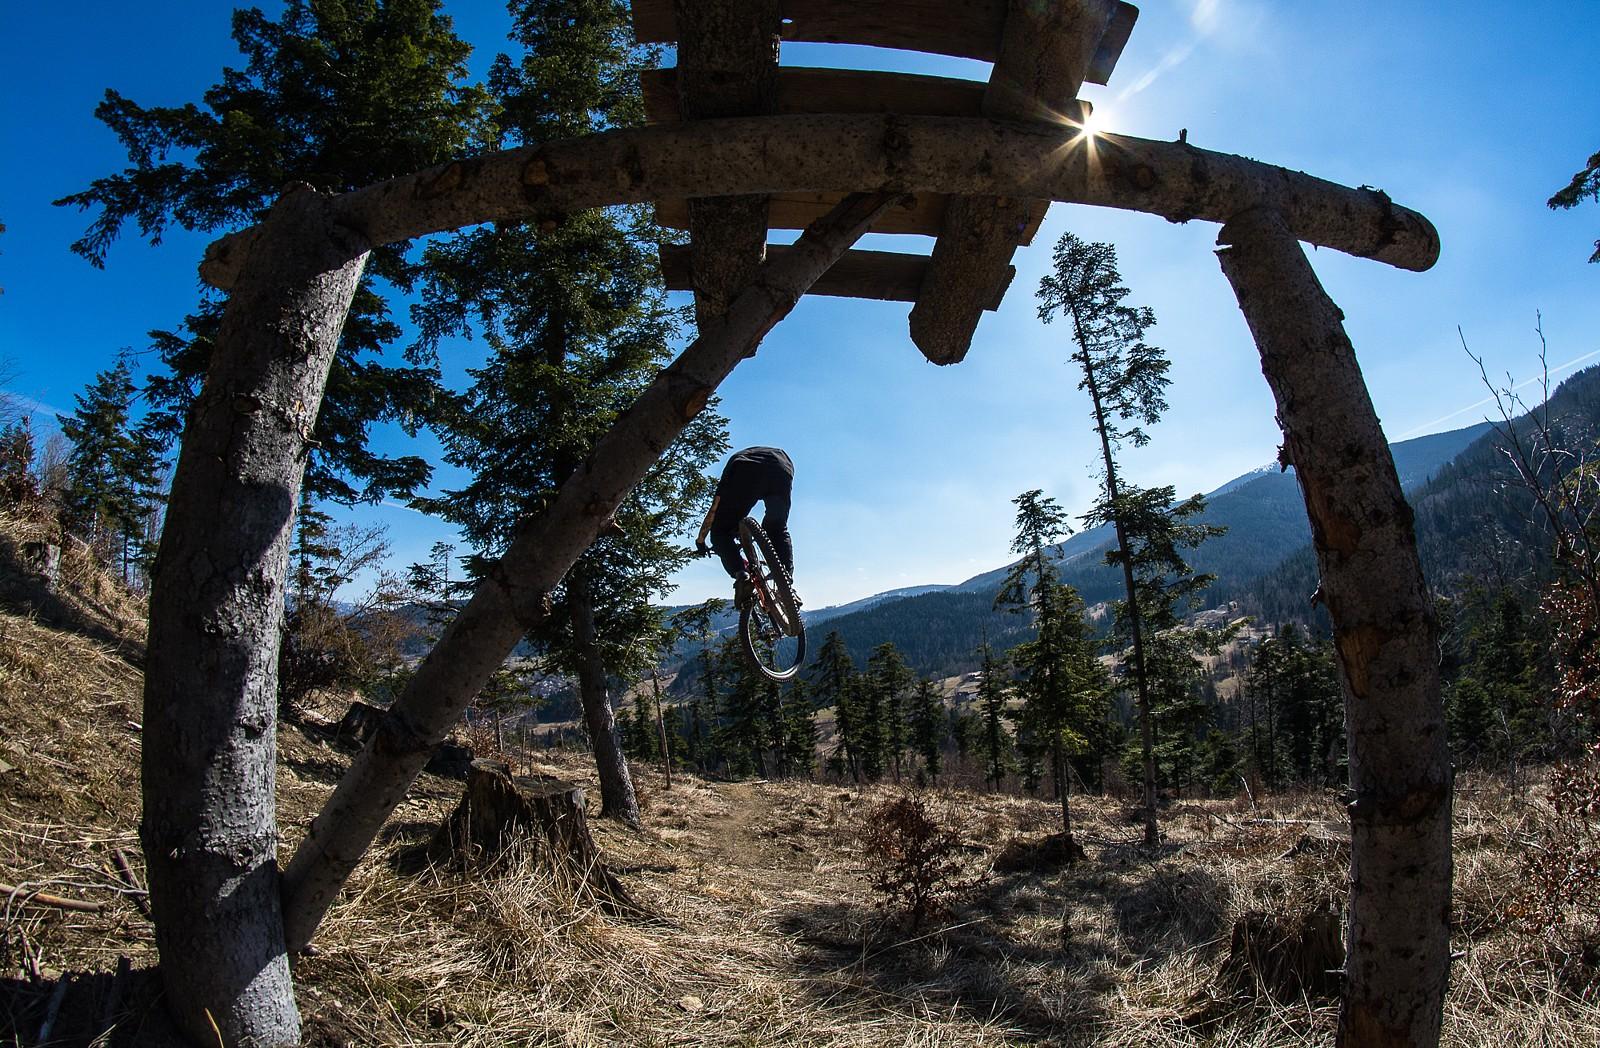 Droppin' into my hometrail - Banan - Mountain Biking Pictures - Vital MTB